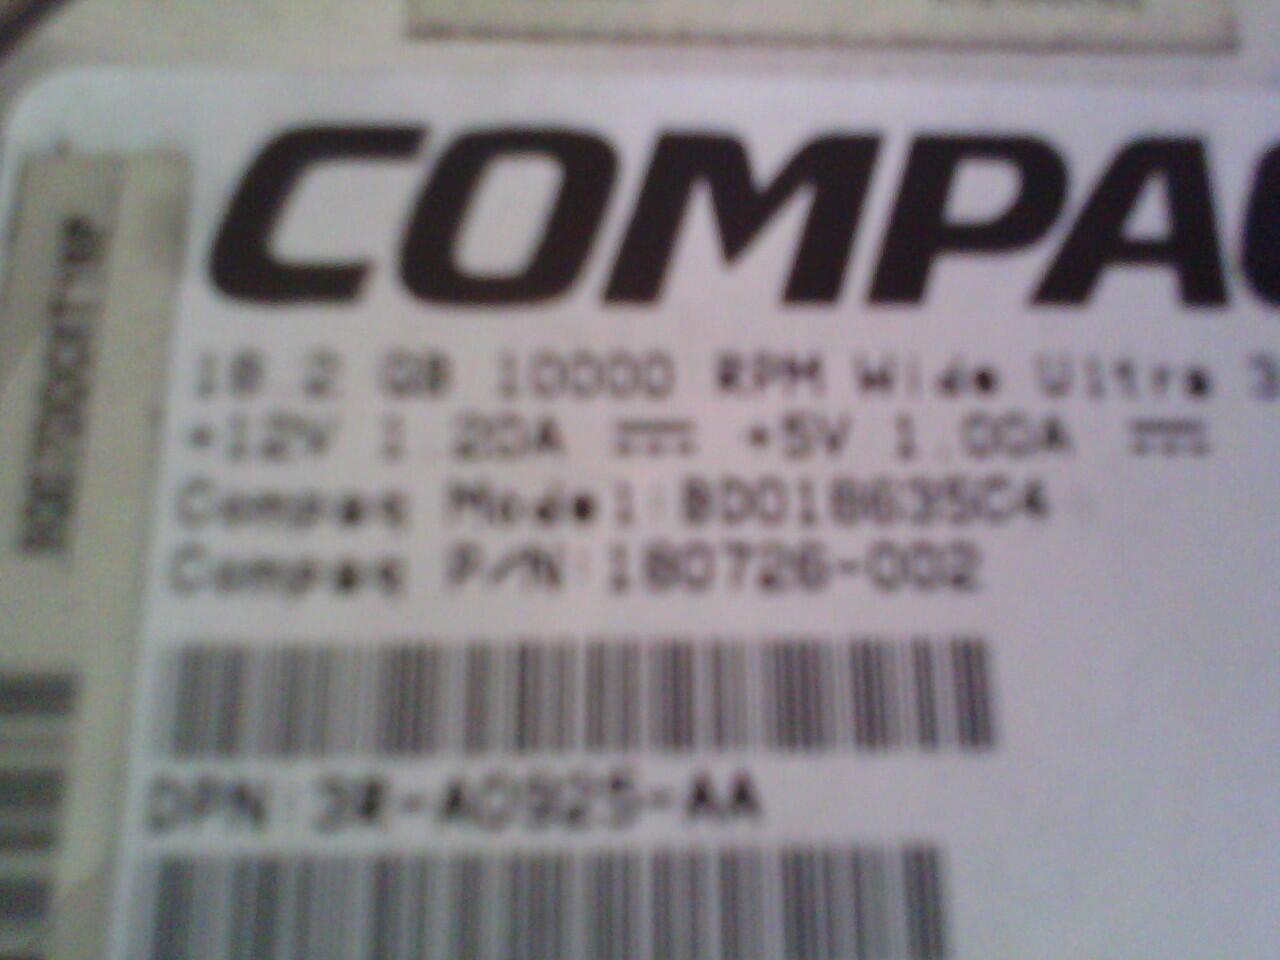 Harddisk SCASI 36,4gb-18,2gb compaq